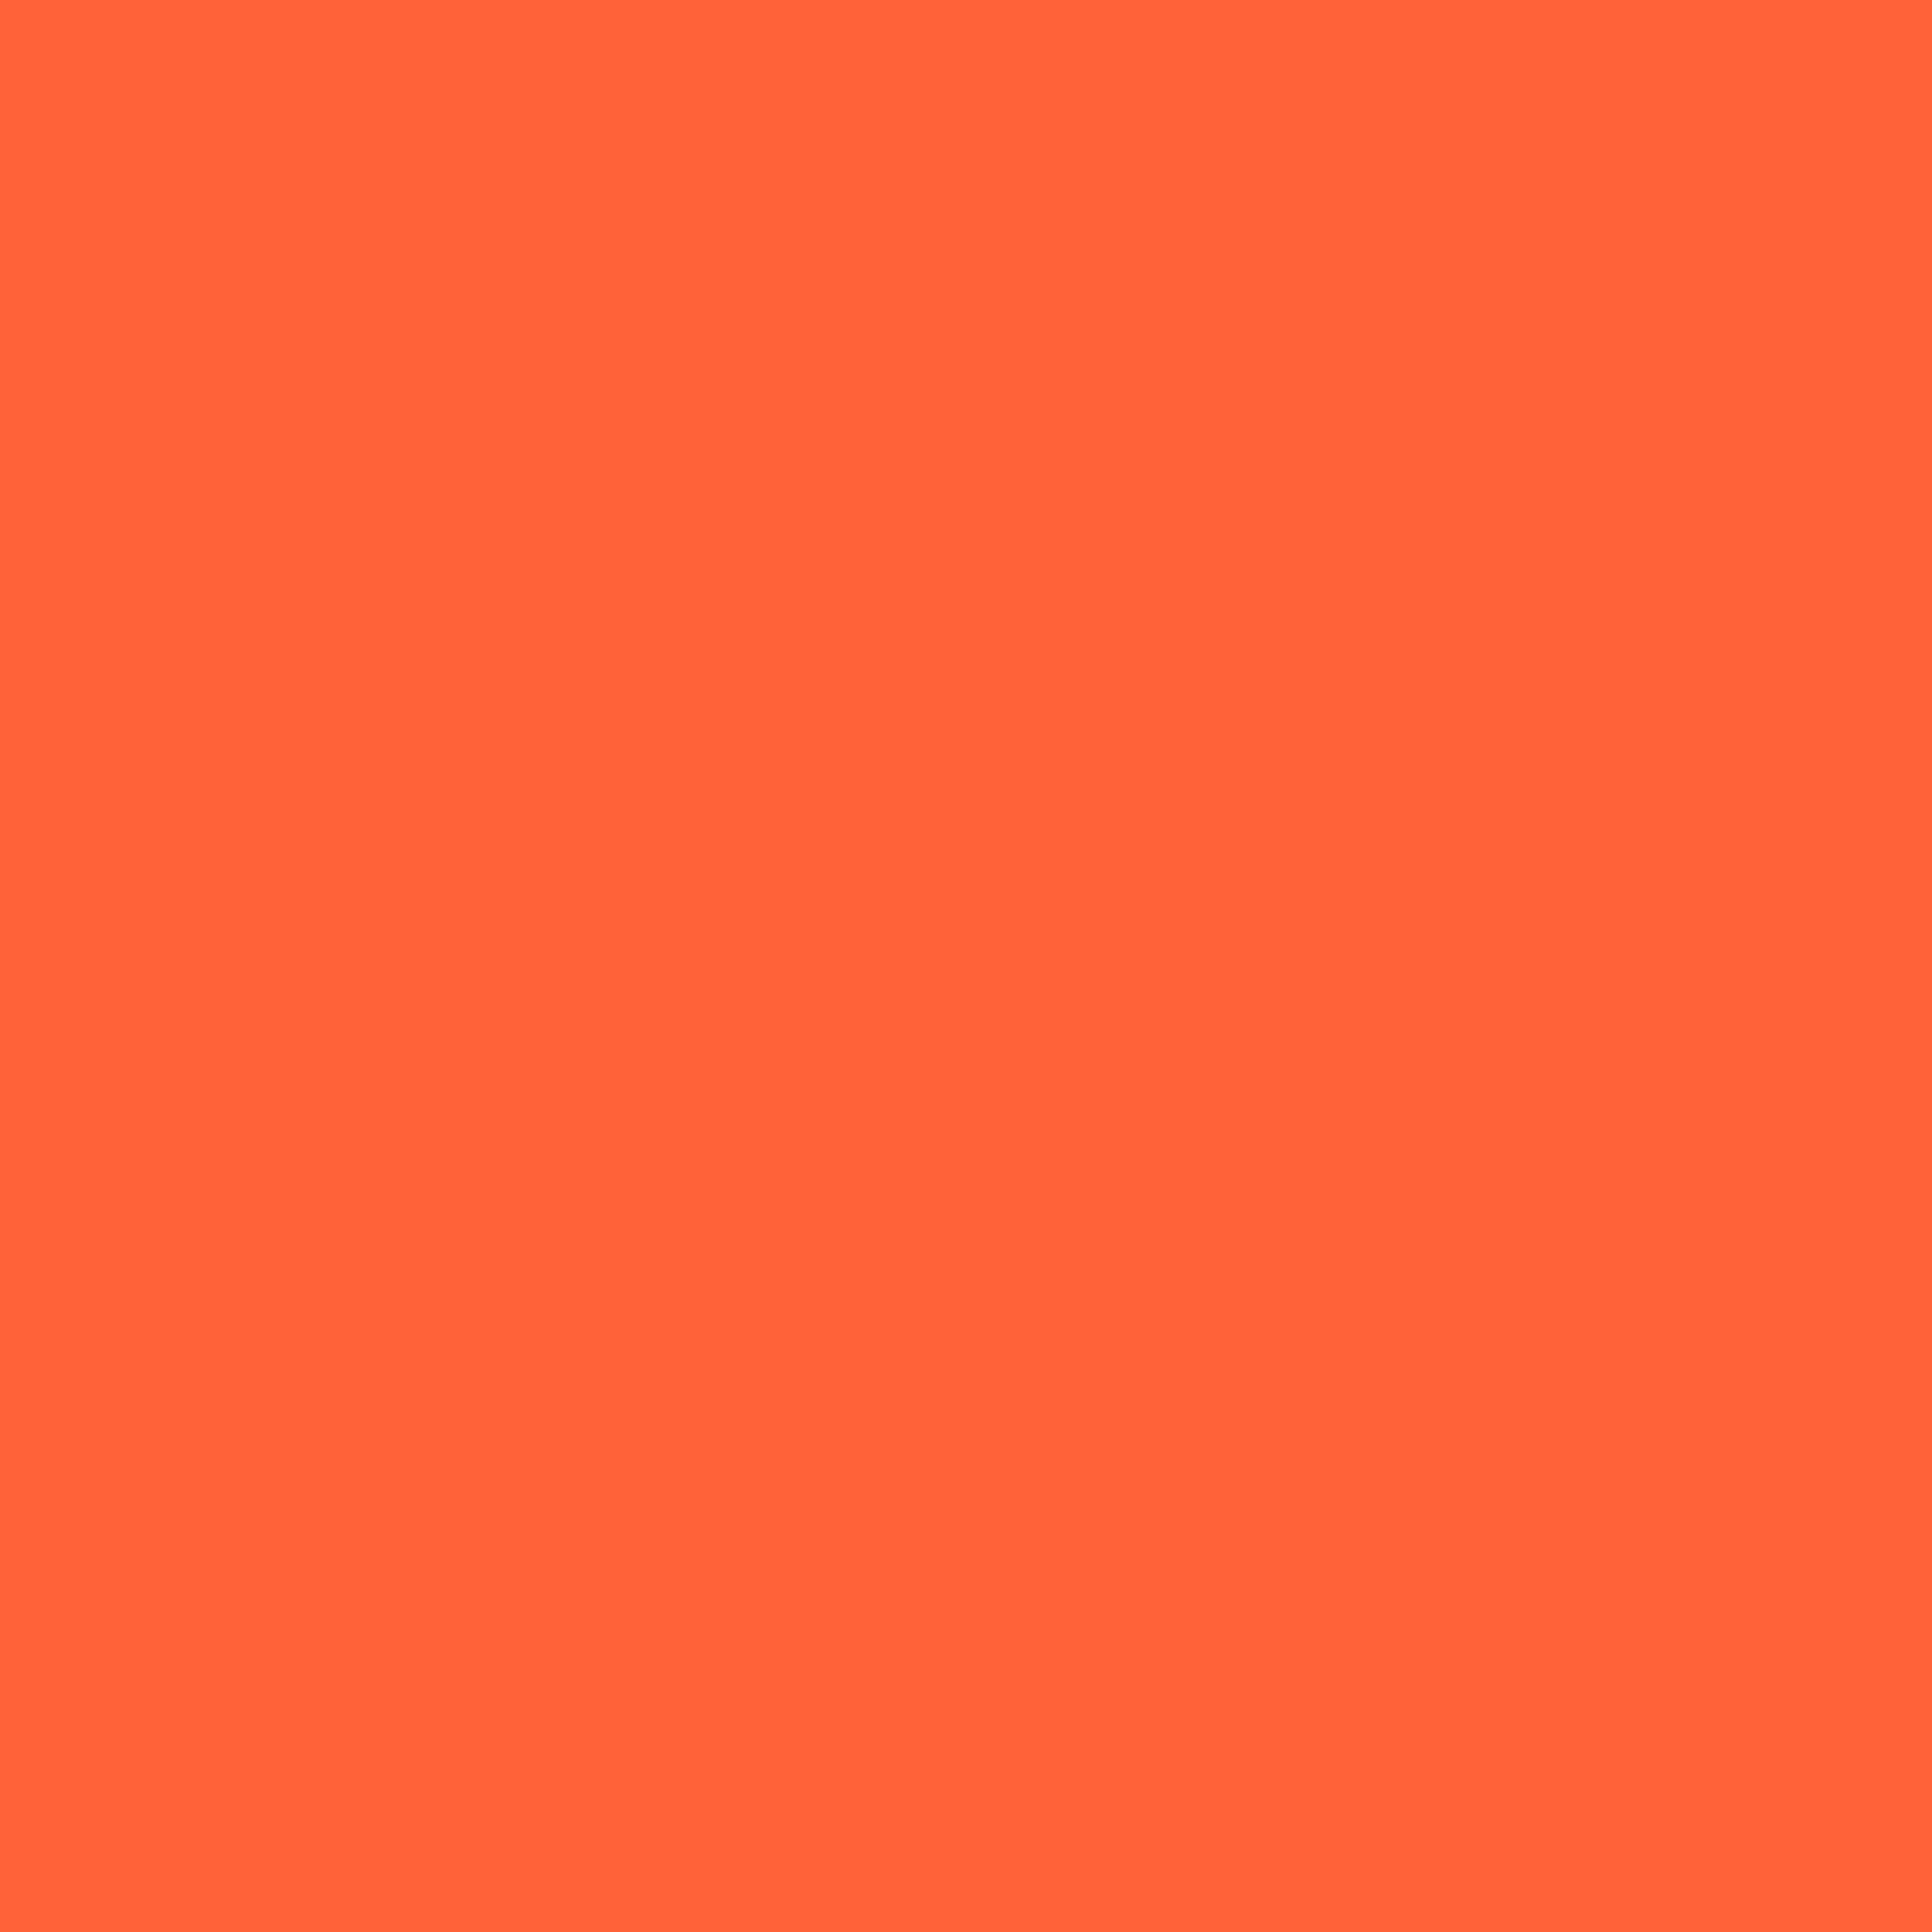 Tangerine Orange Simple Flat iPad Wallpaper HD